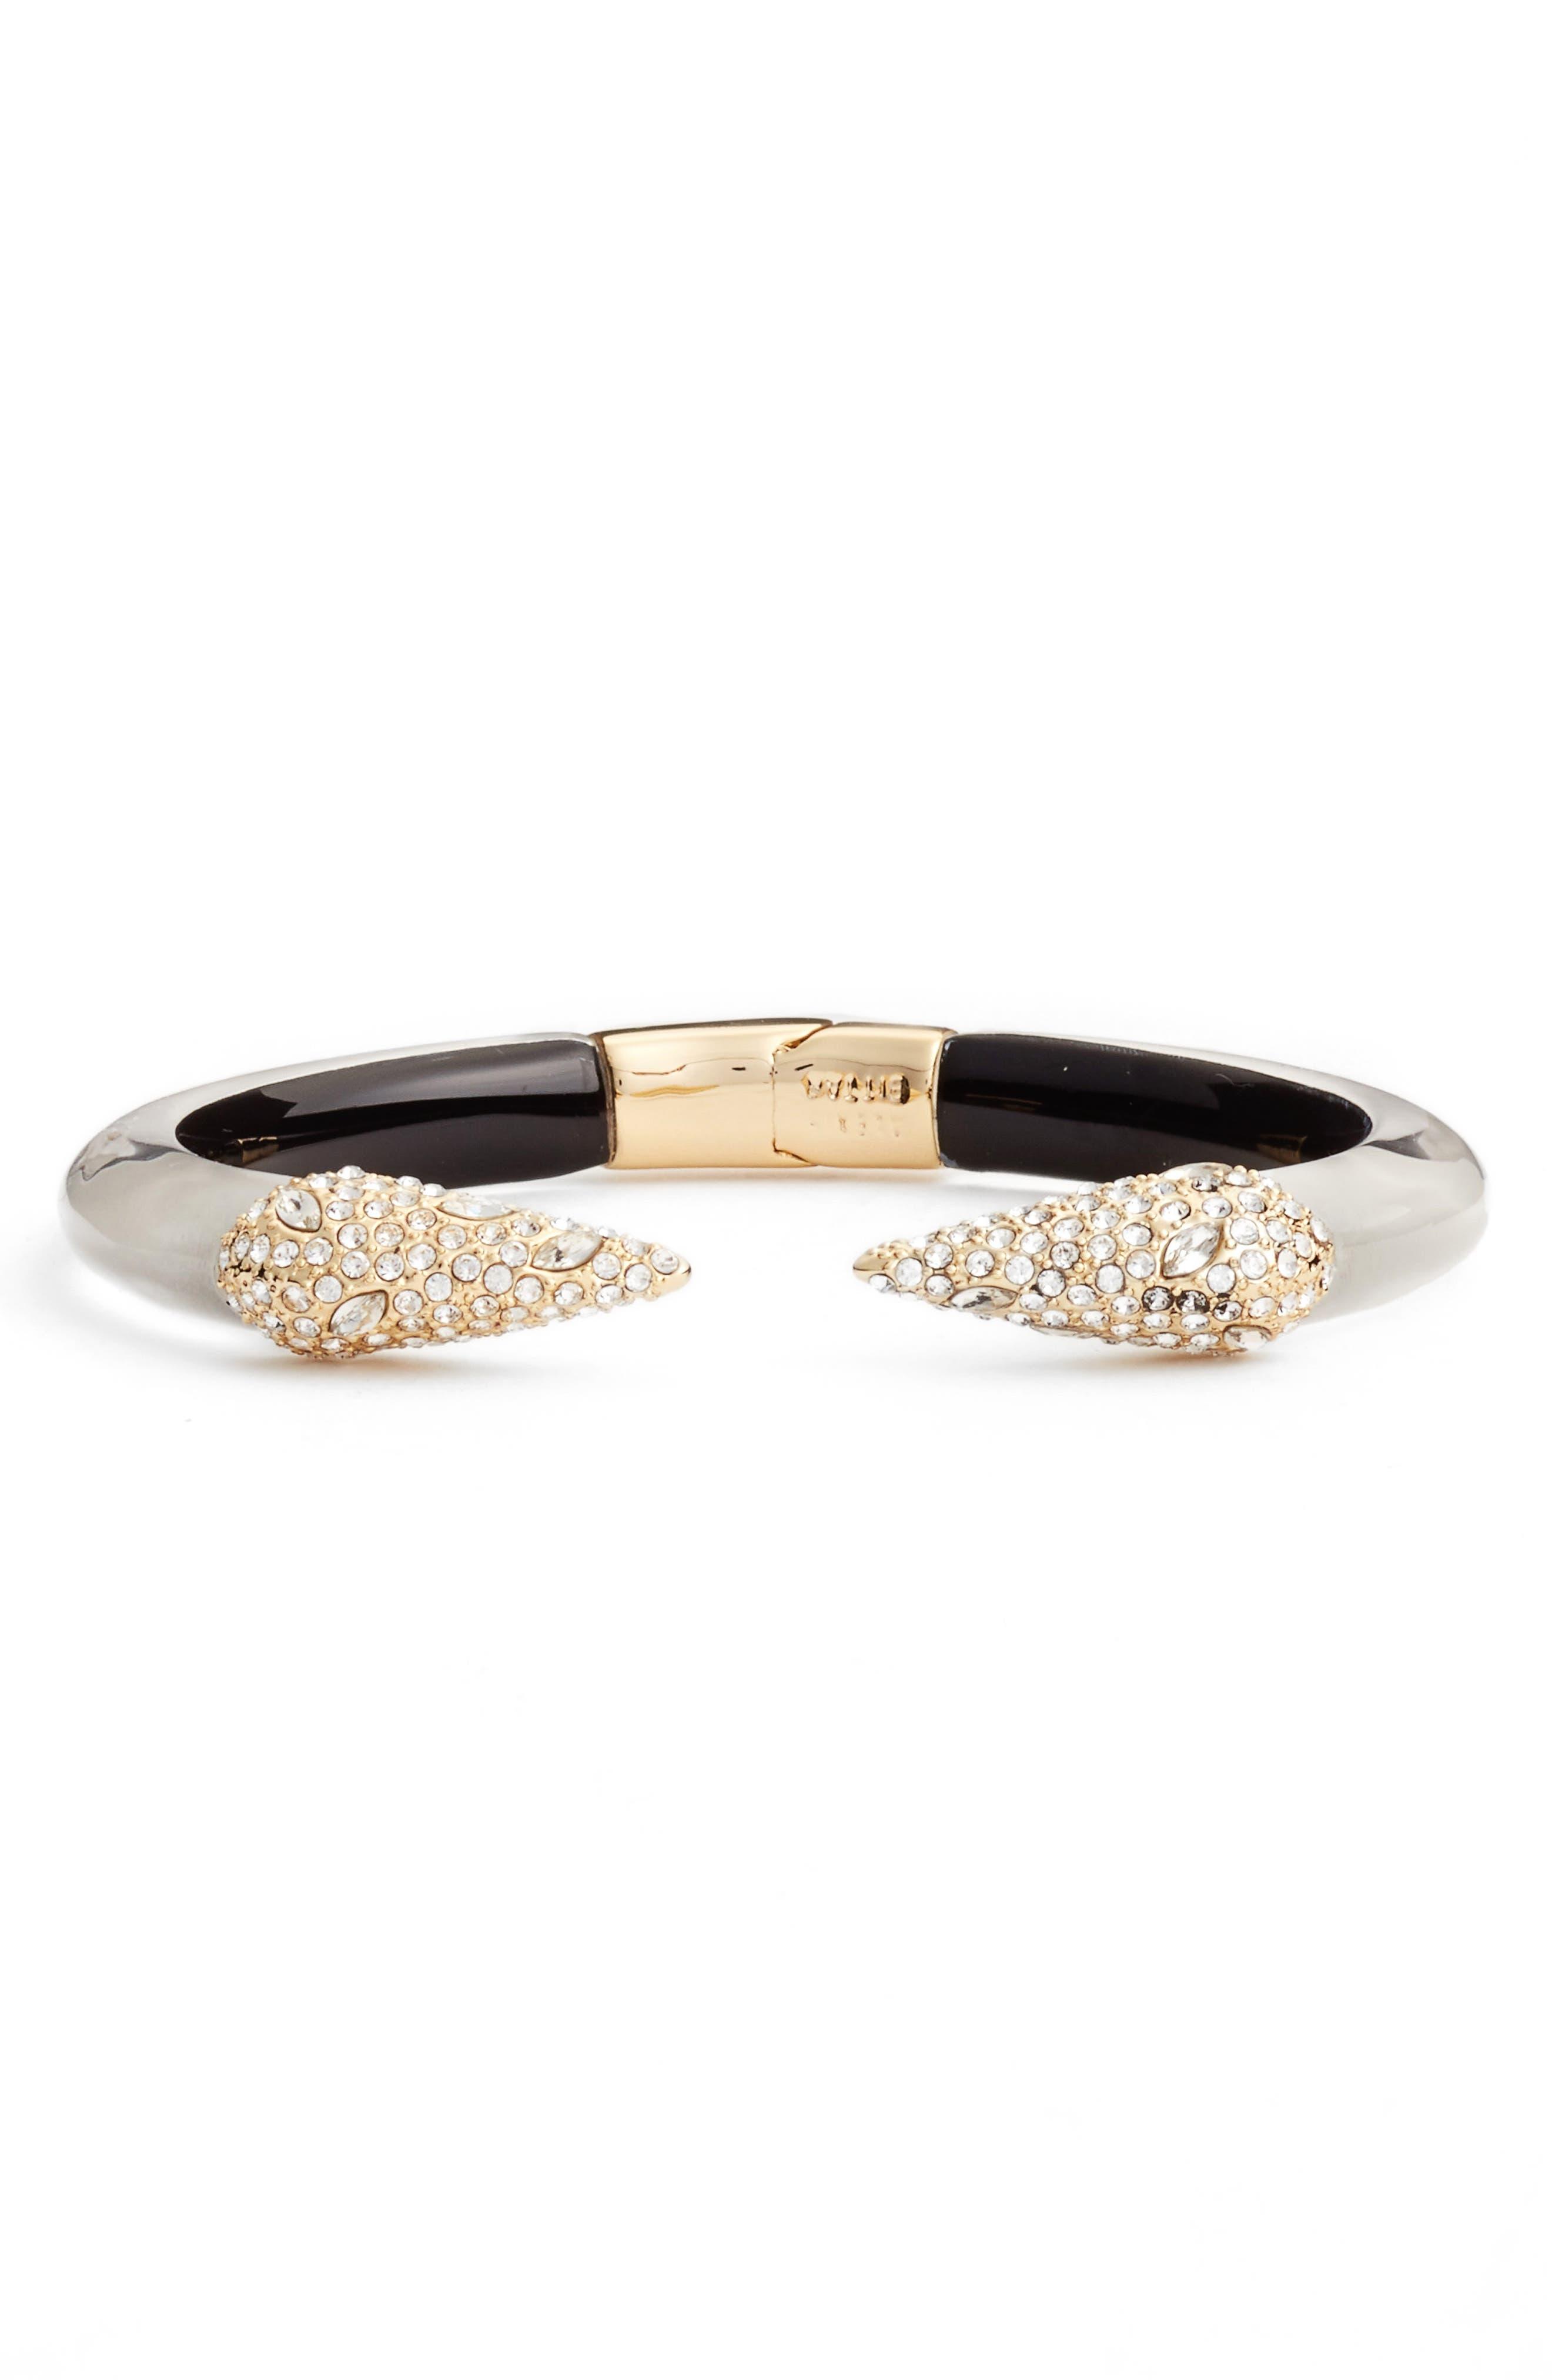 Encrusted Hinge Bracelet,                             Main thumbnail 1, color,                             Polished Silver